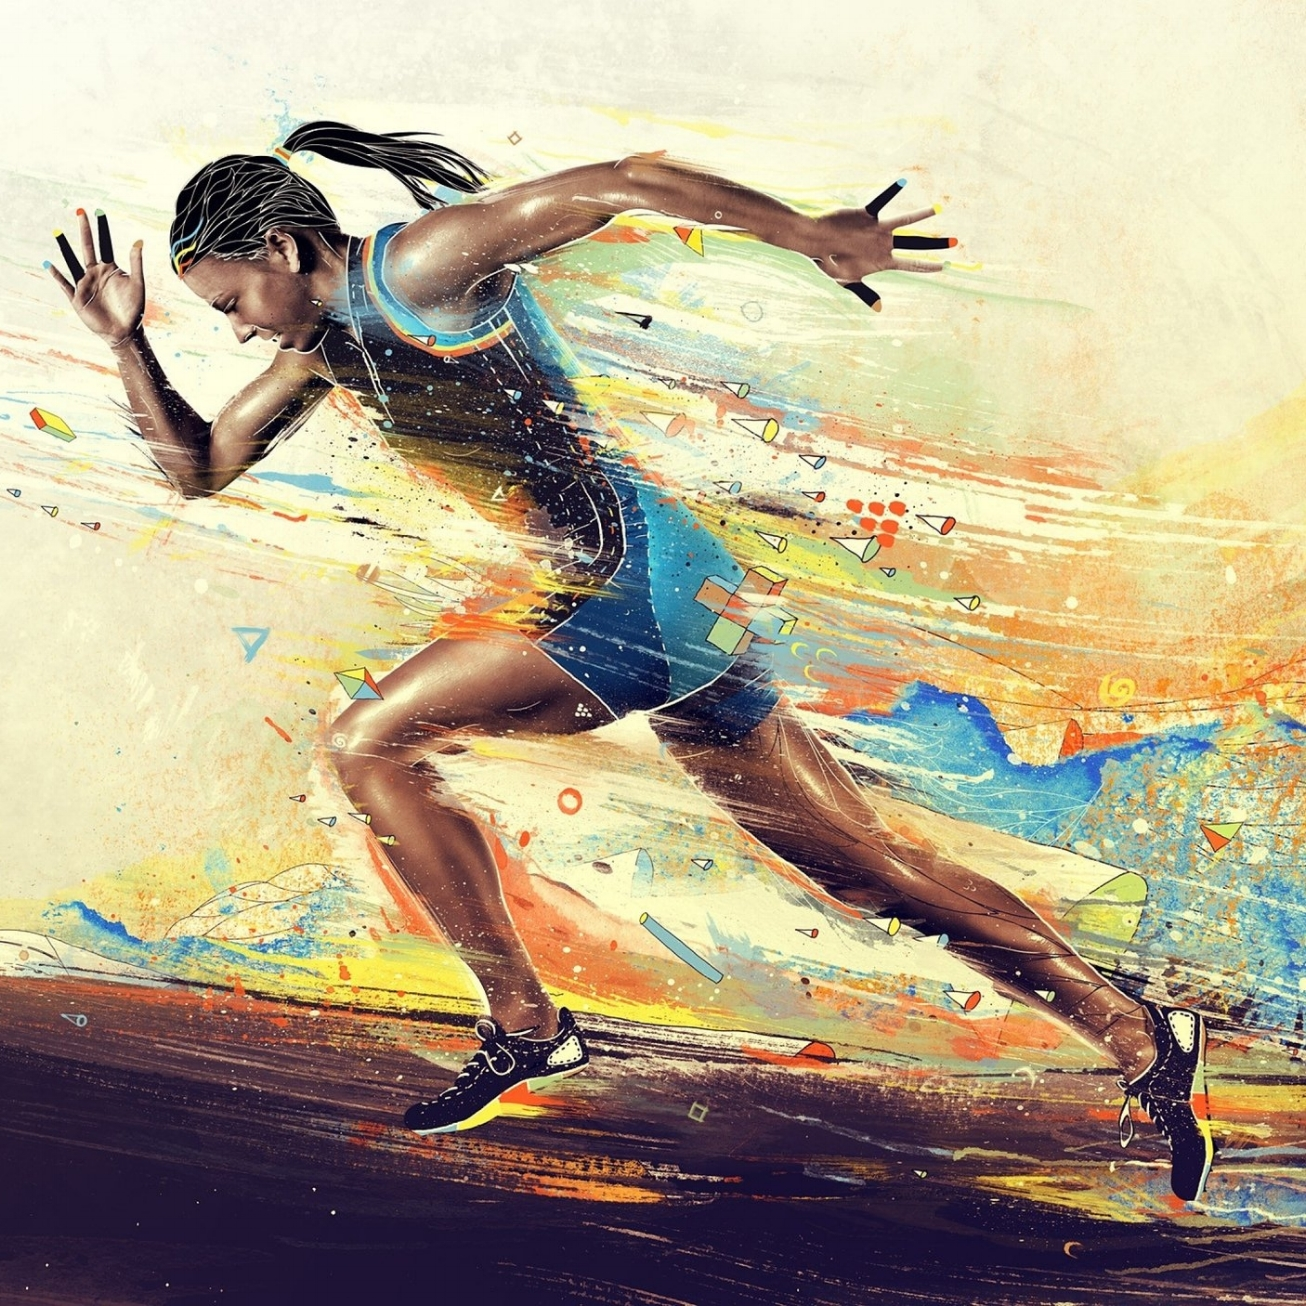 girl_athlete_running_paint_smeared_62133_3840x216011.jpg